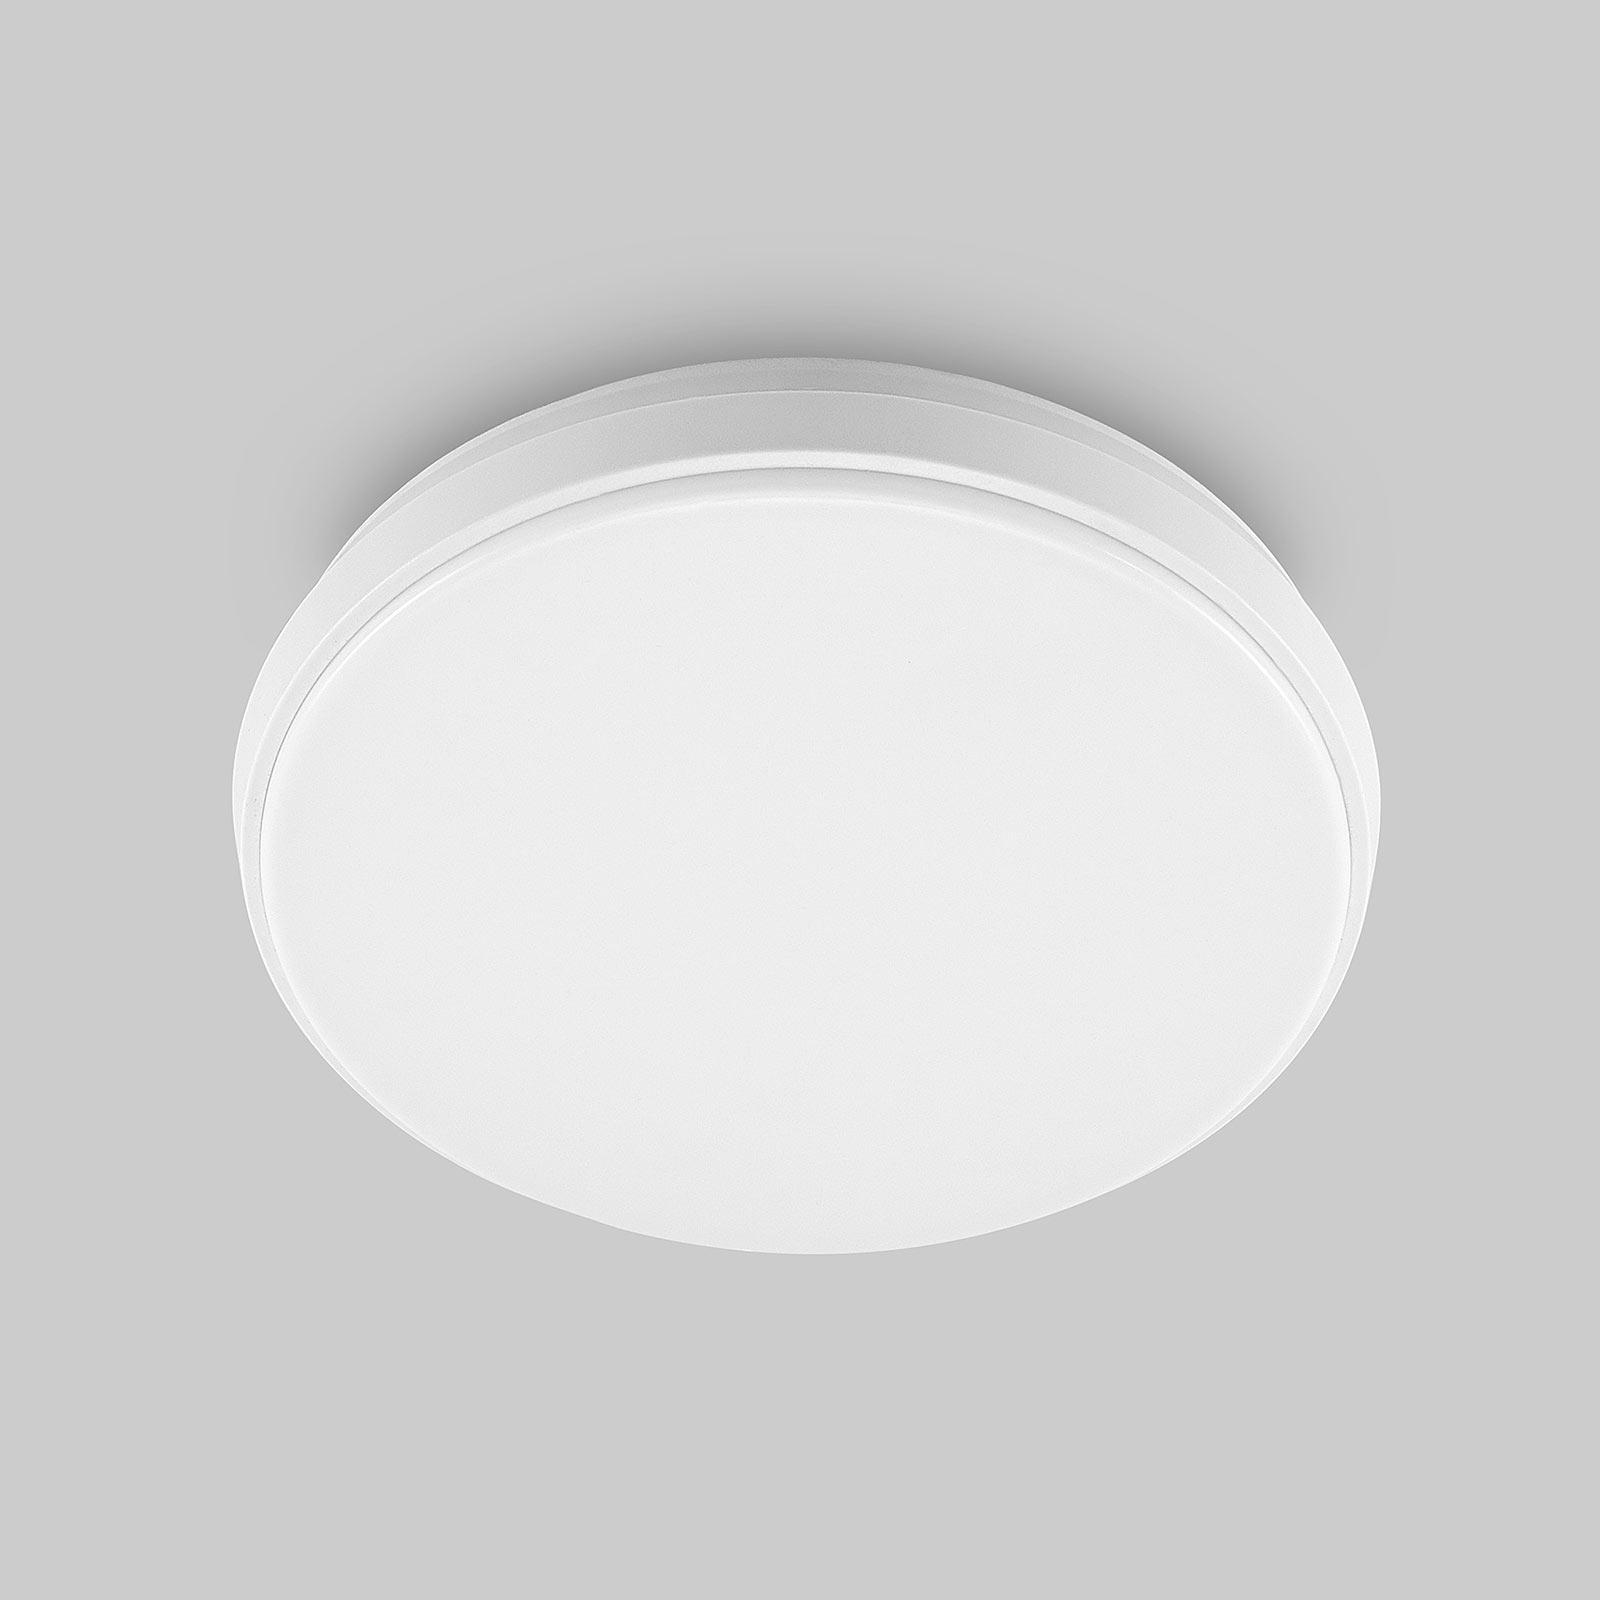 Arcchio Brady -LED-kattovalaisin, pyöreä, 25 cm